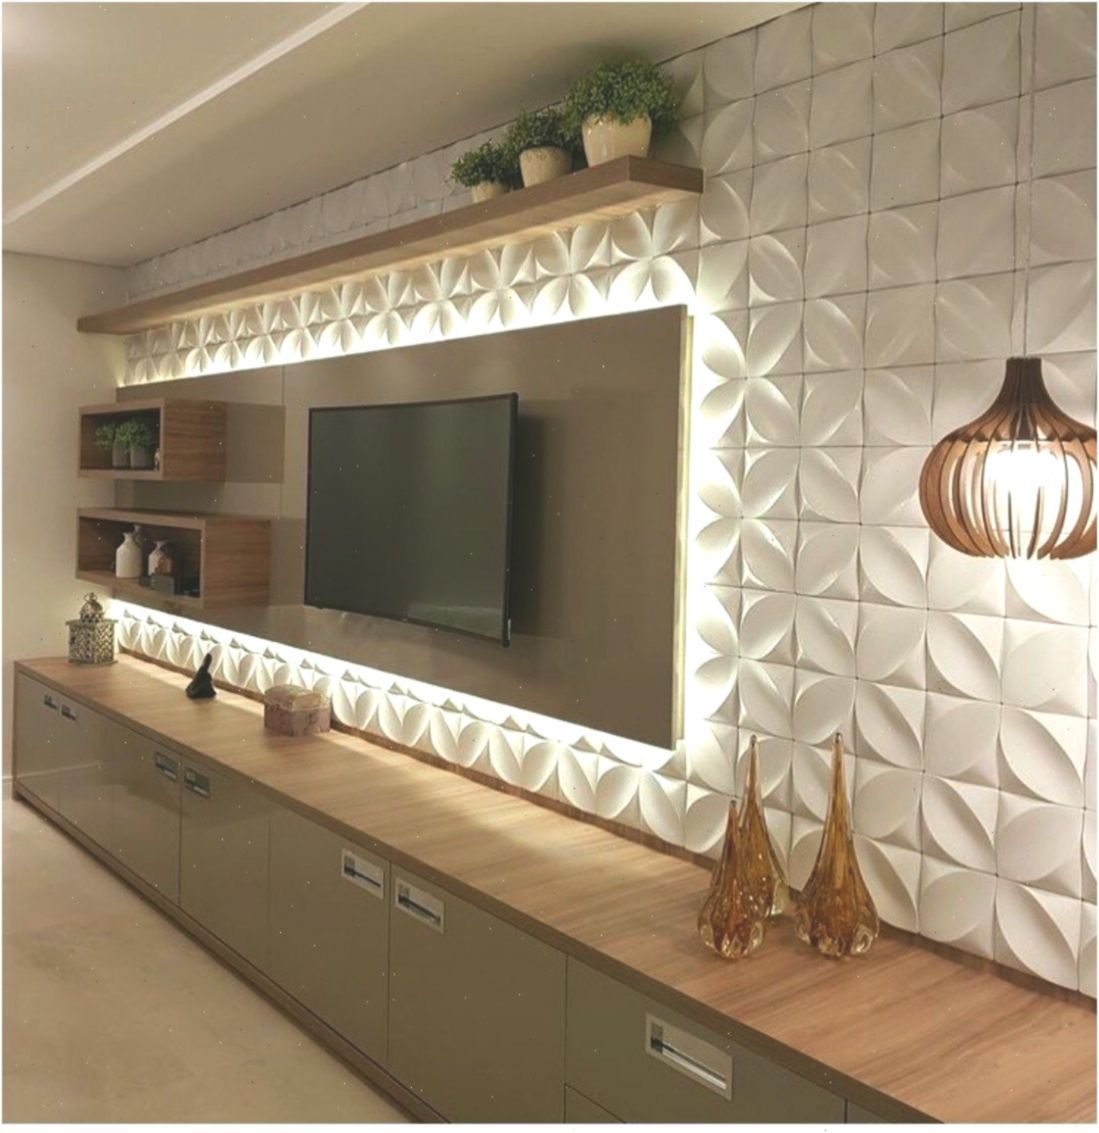 30 Amazing Tv Unit Design Ideas For Your Living Room Tvgert Amazing Design Ideas Living Livi In 2020 Tv Room Design Living Room Design Modern Luxury Living Room #tv #unit #designs #in #living #room